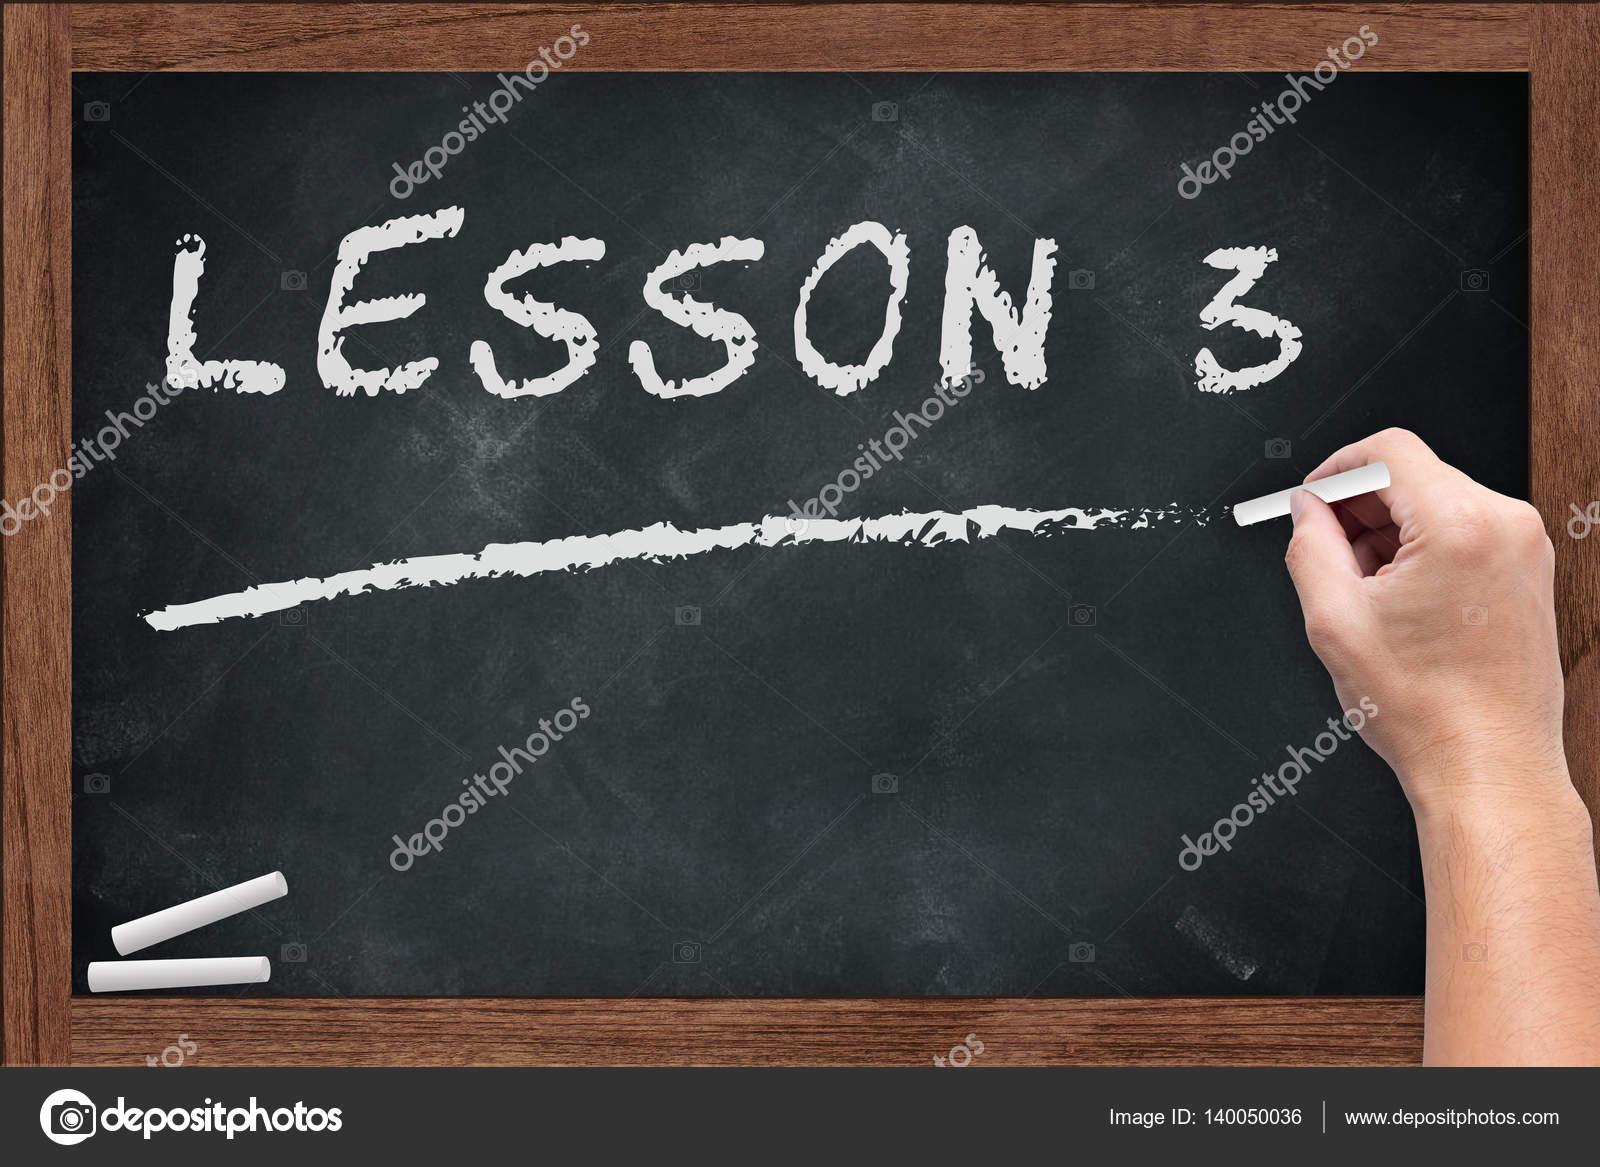 lesson 3 white chalk text write on chalkboard or school blackboard stock photo coffeekai. Black Bedroom Furniture Sets. Home Design Ideas